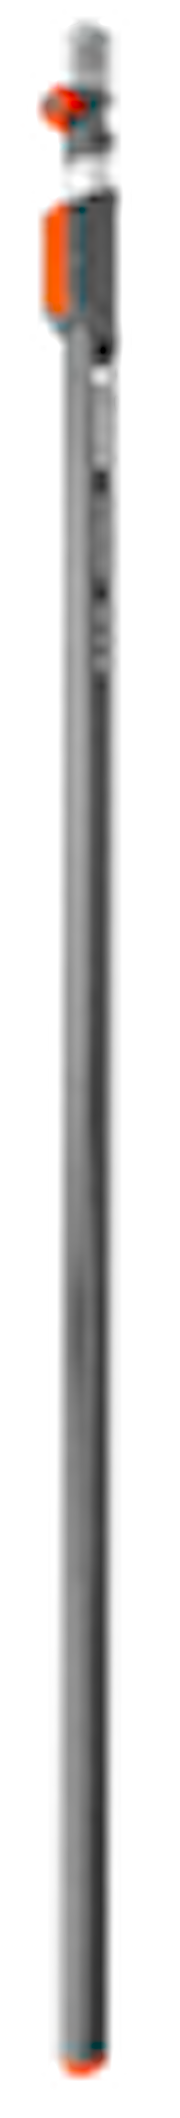 combisystem-teleskopskaft-160-290-cm-1